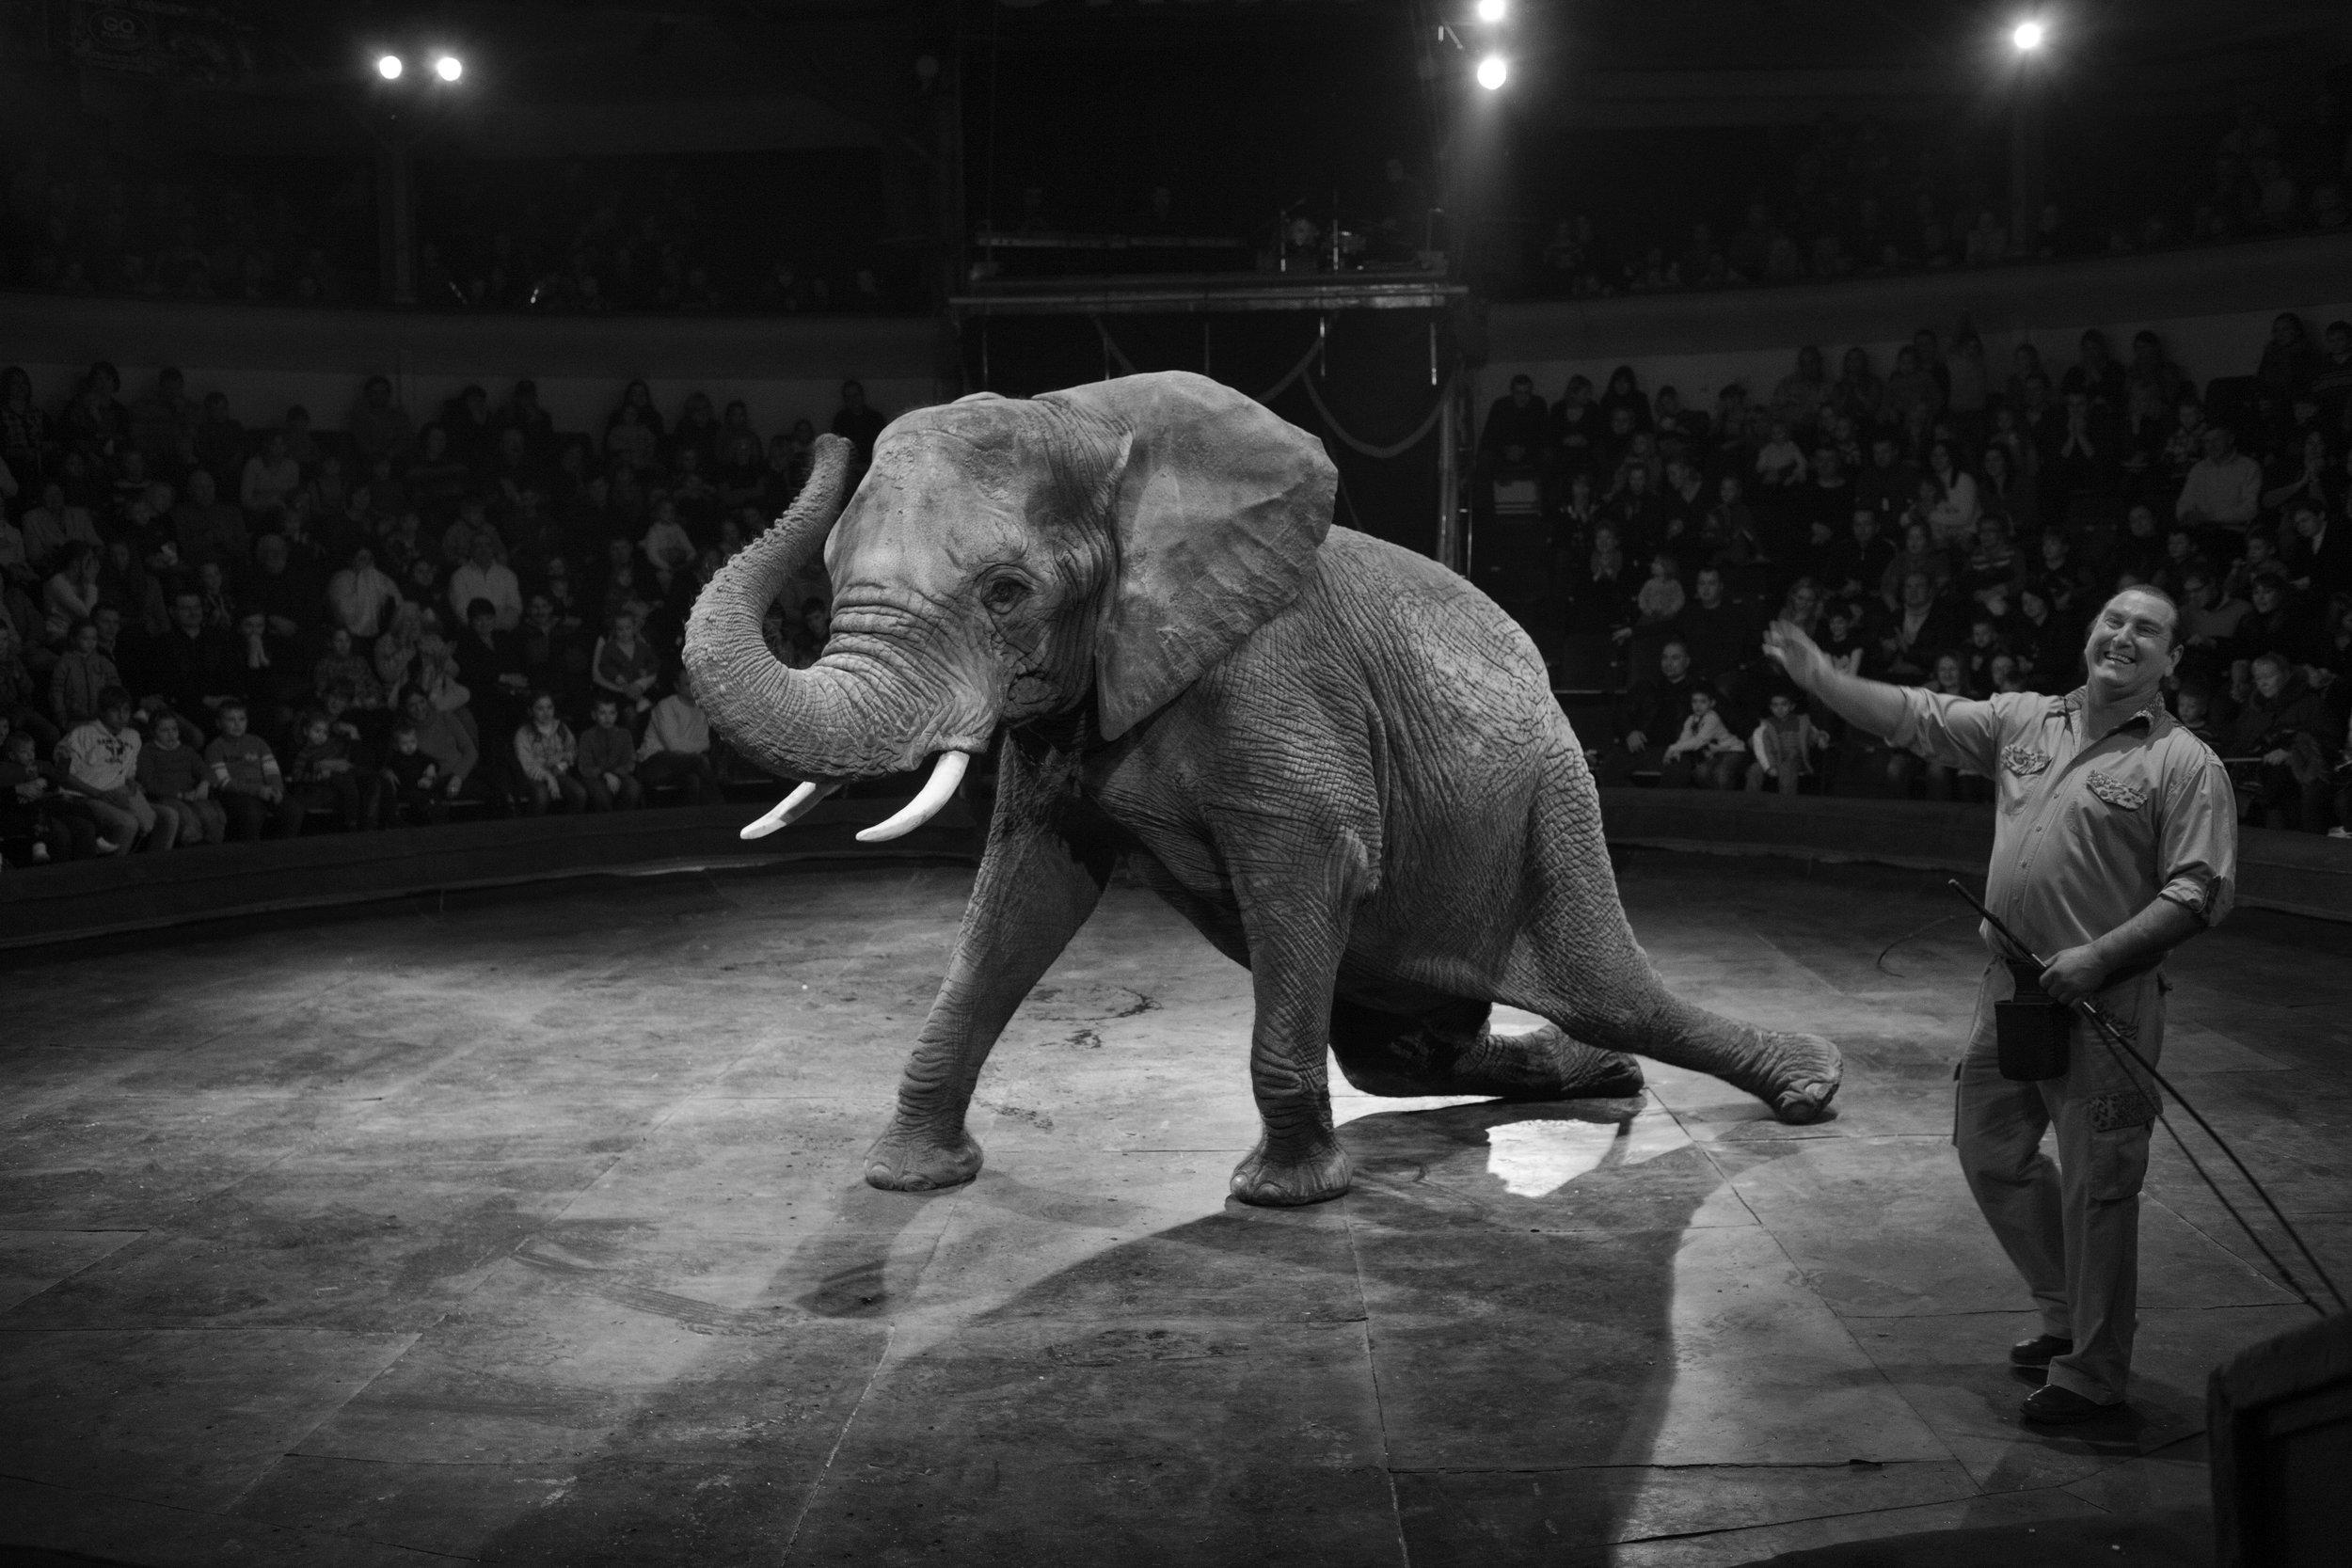 IMG_5685-elefante-circus-OK-ig.jpg